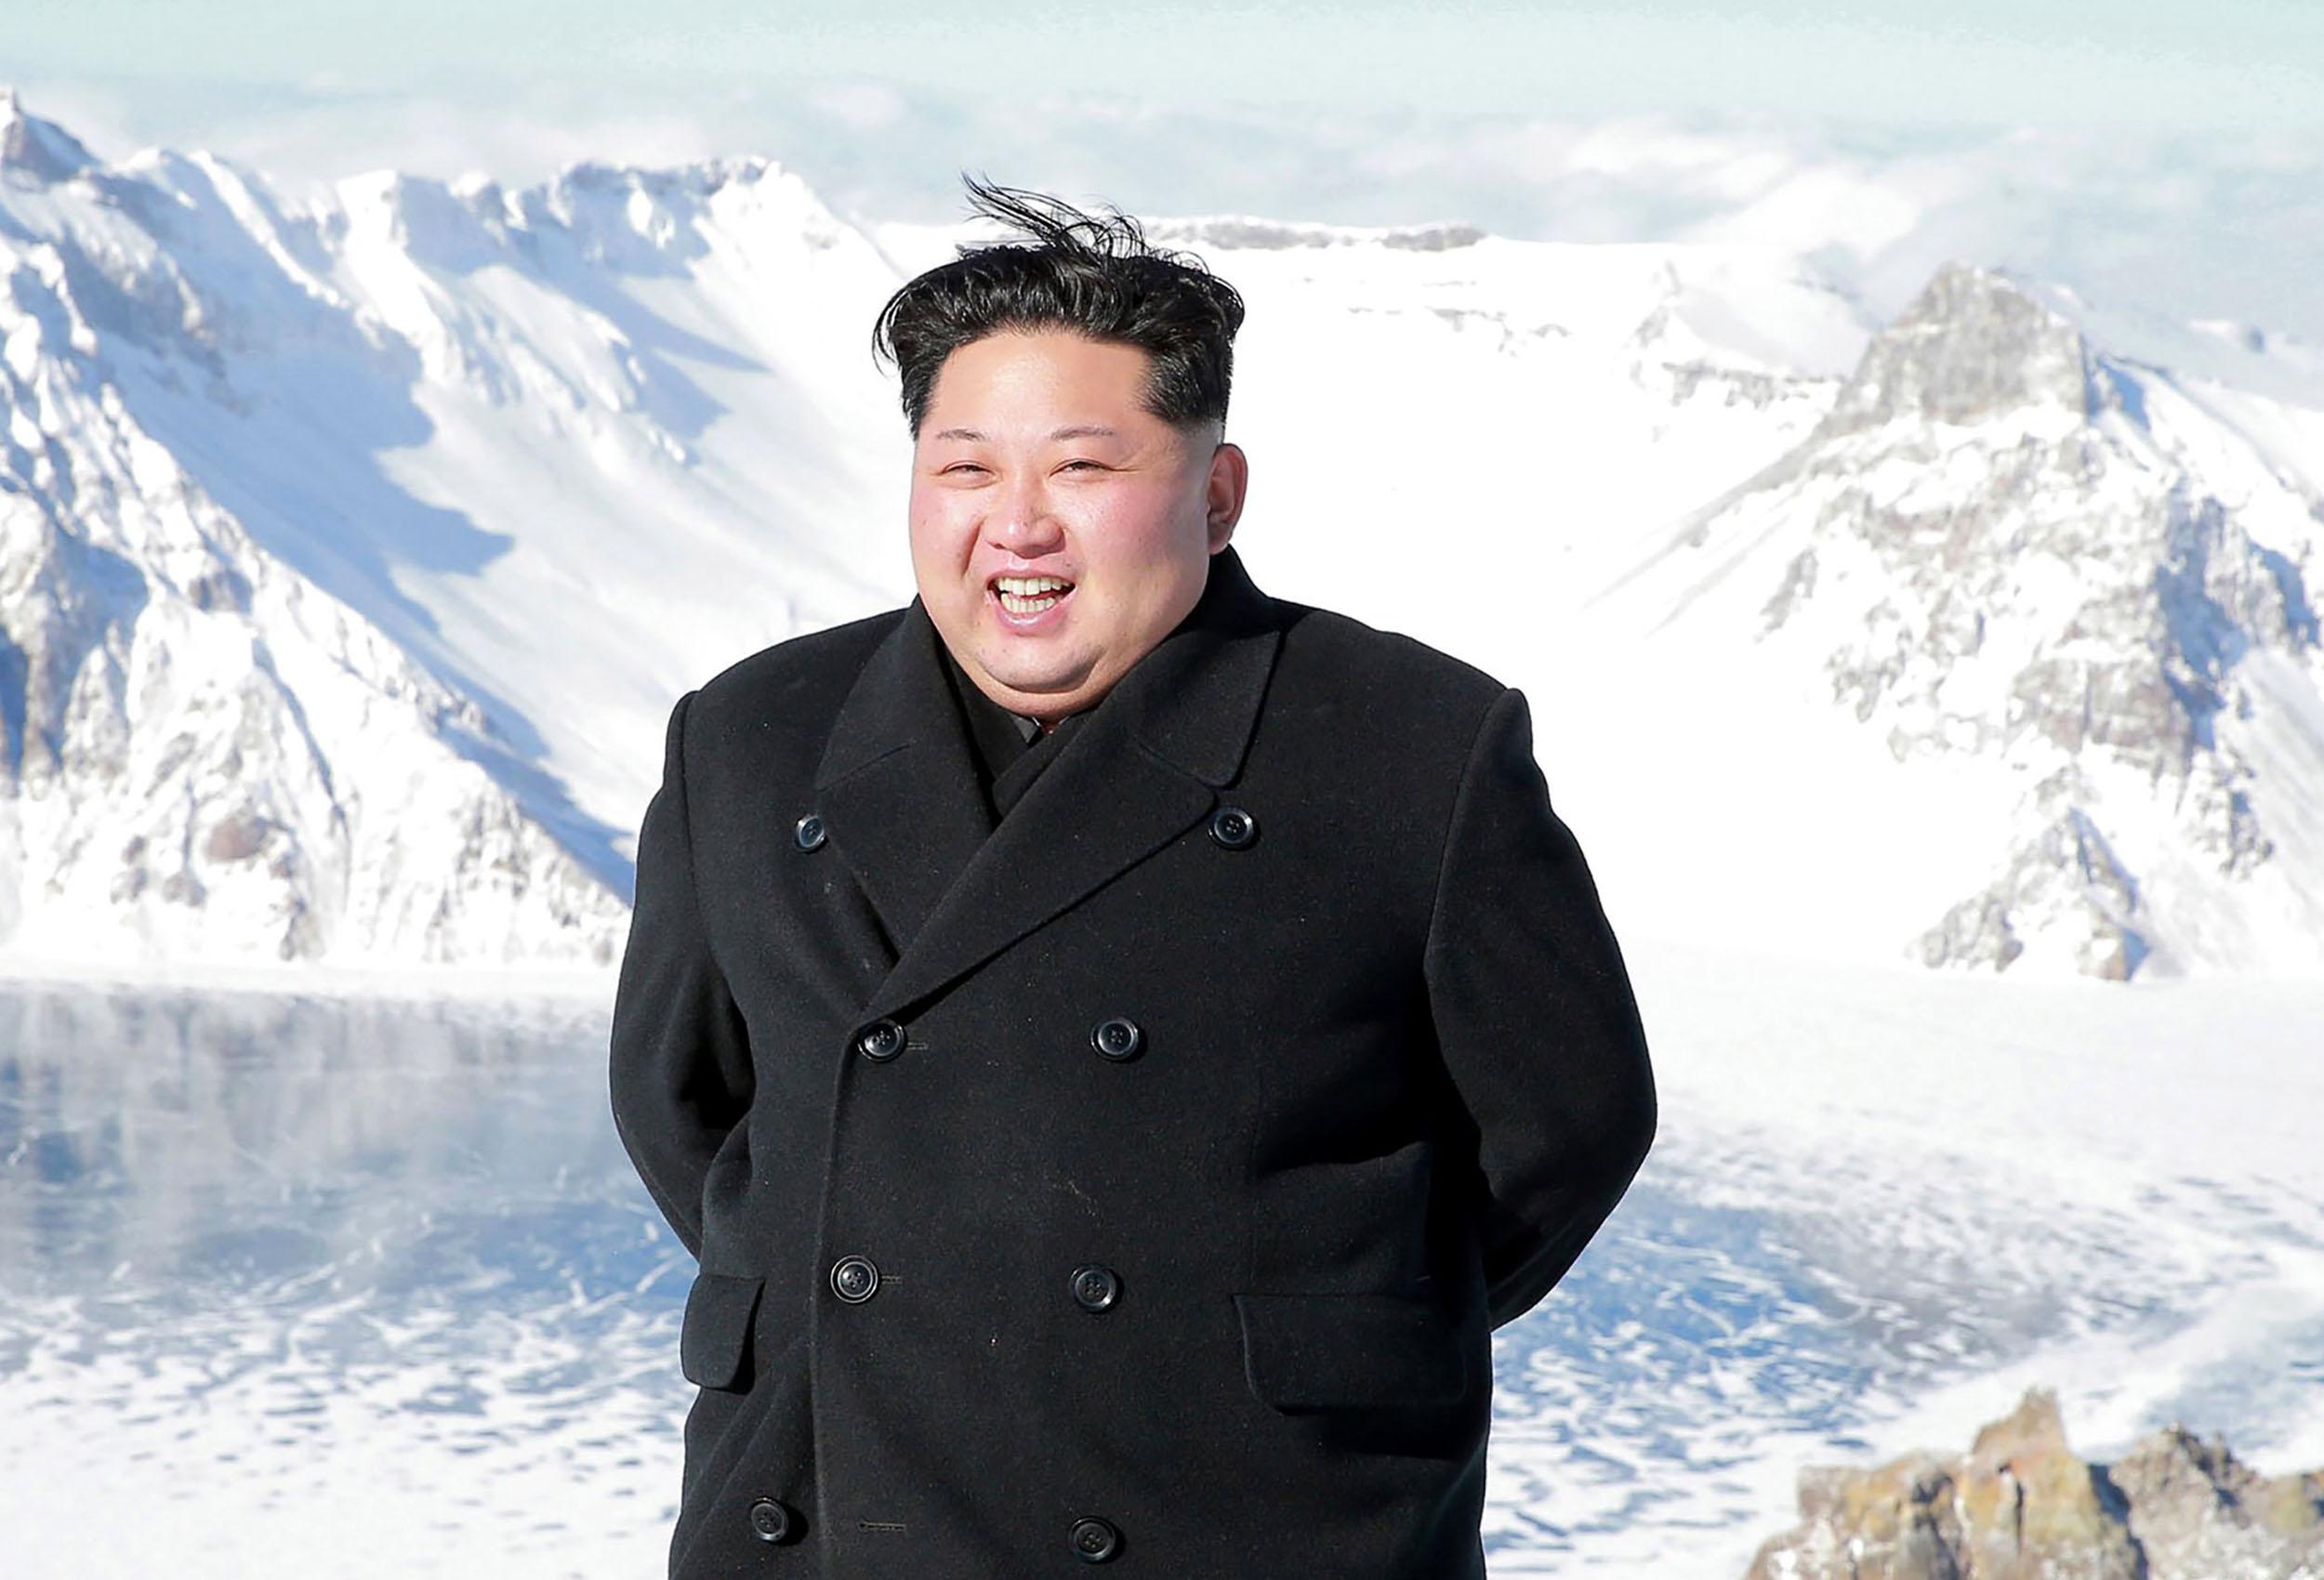 Image: Kim Jong-Un